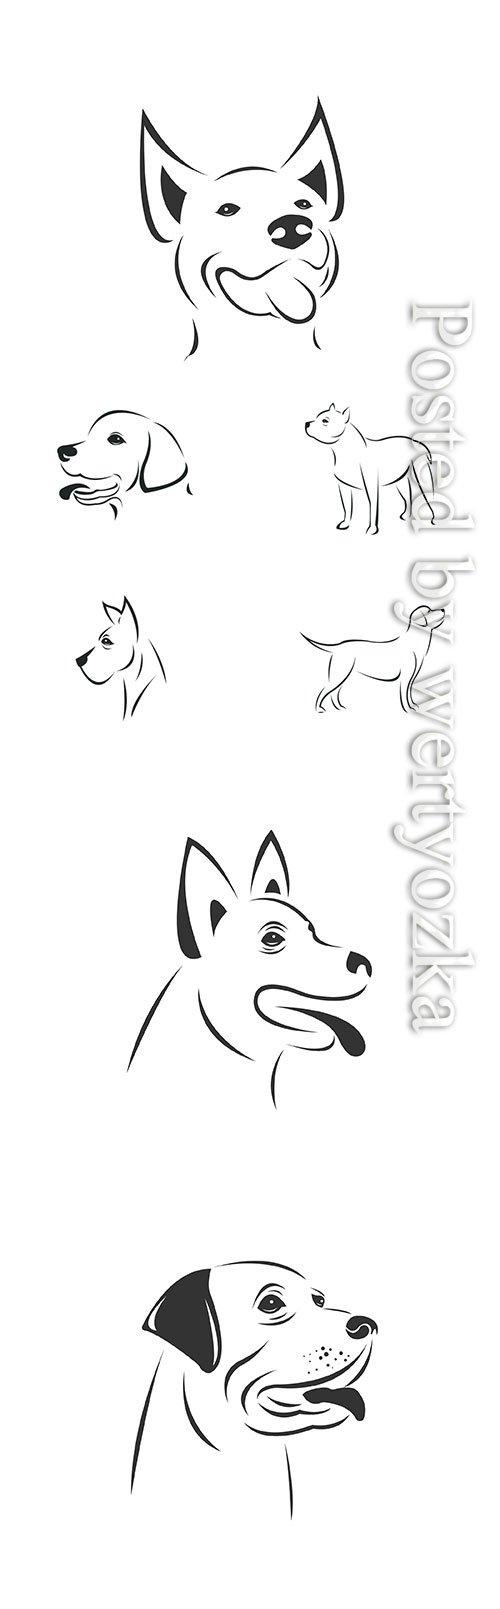 Vector image of an Dog black and white, animal logo